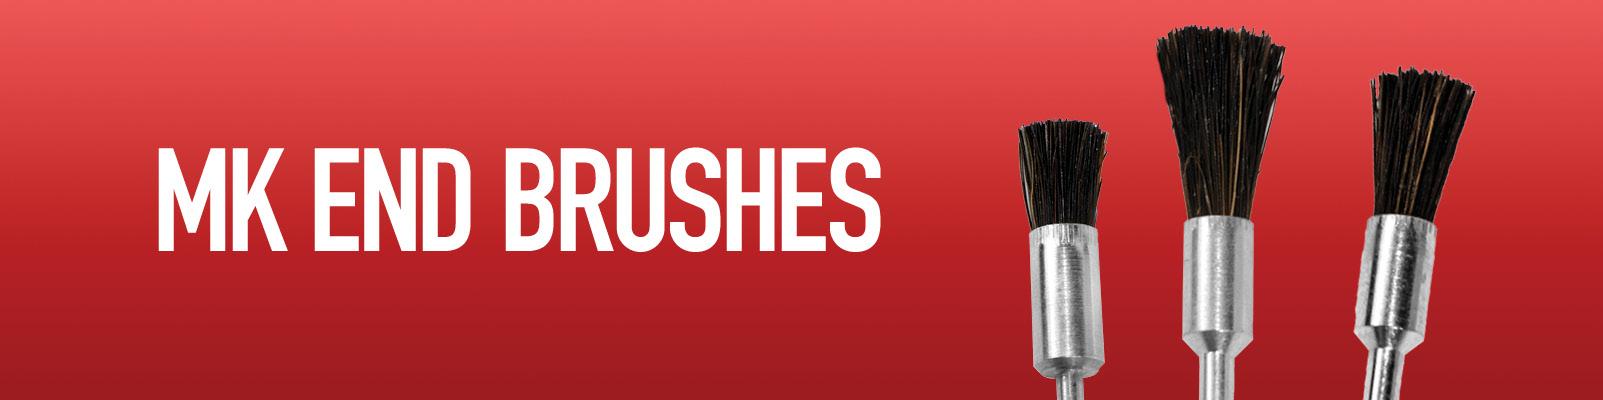 MK End Brushes